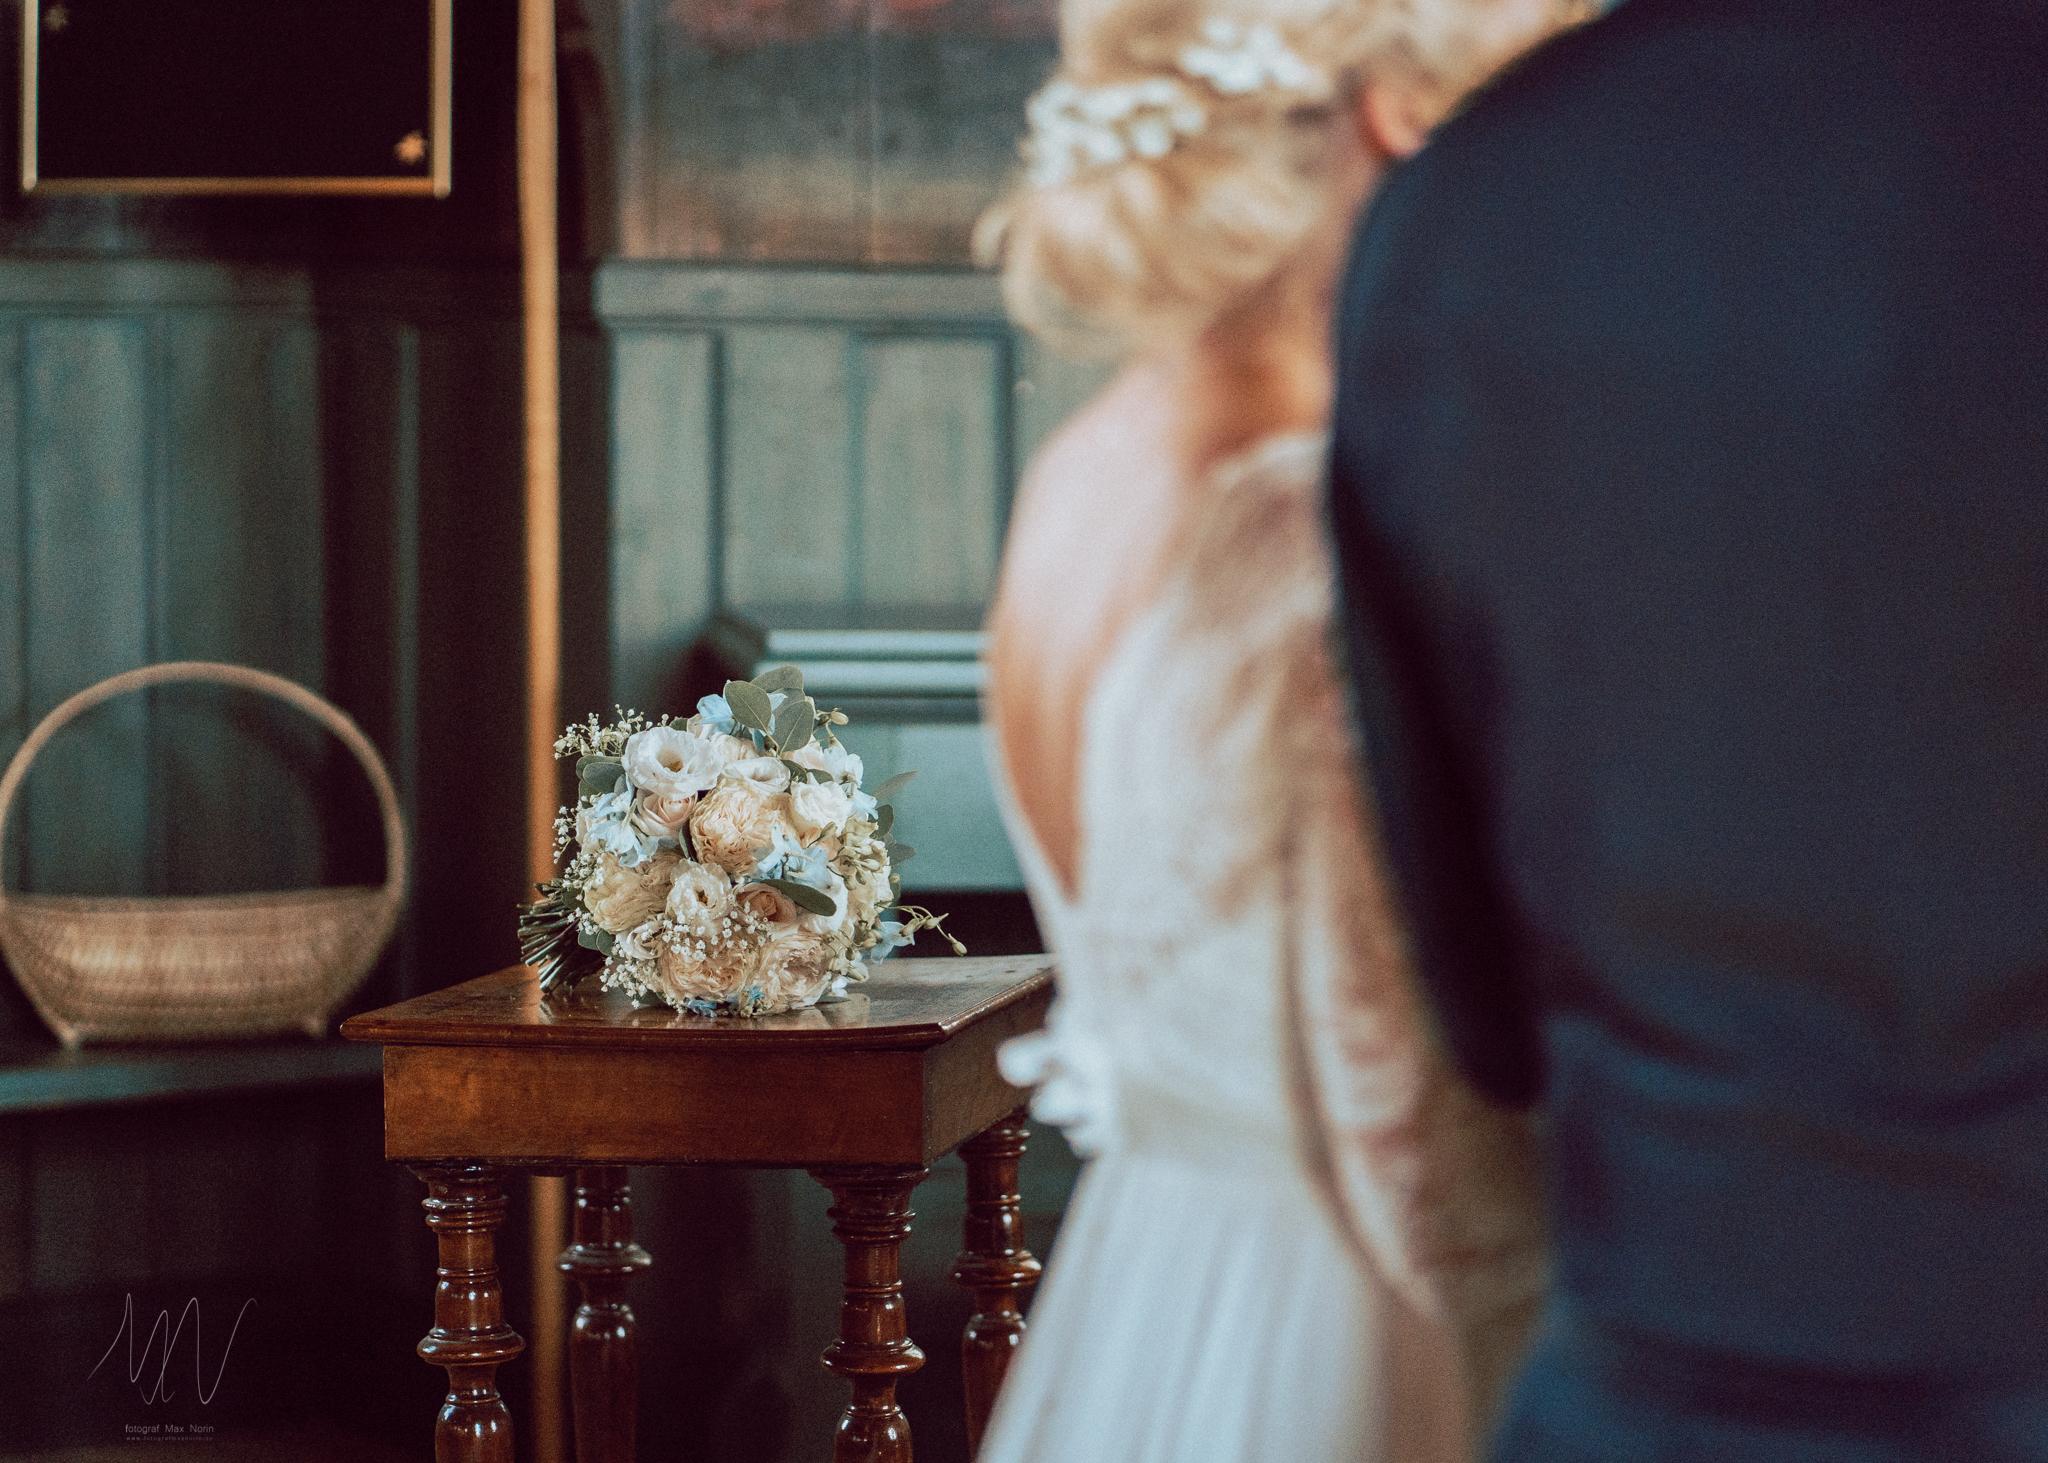 Bröllop-fotografmaxnorin.se-MariaMarcus-116.JPG